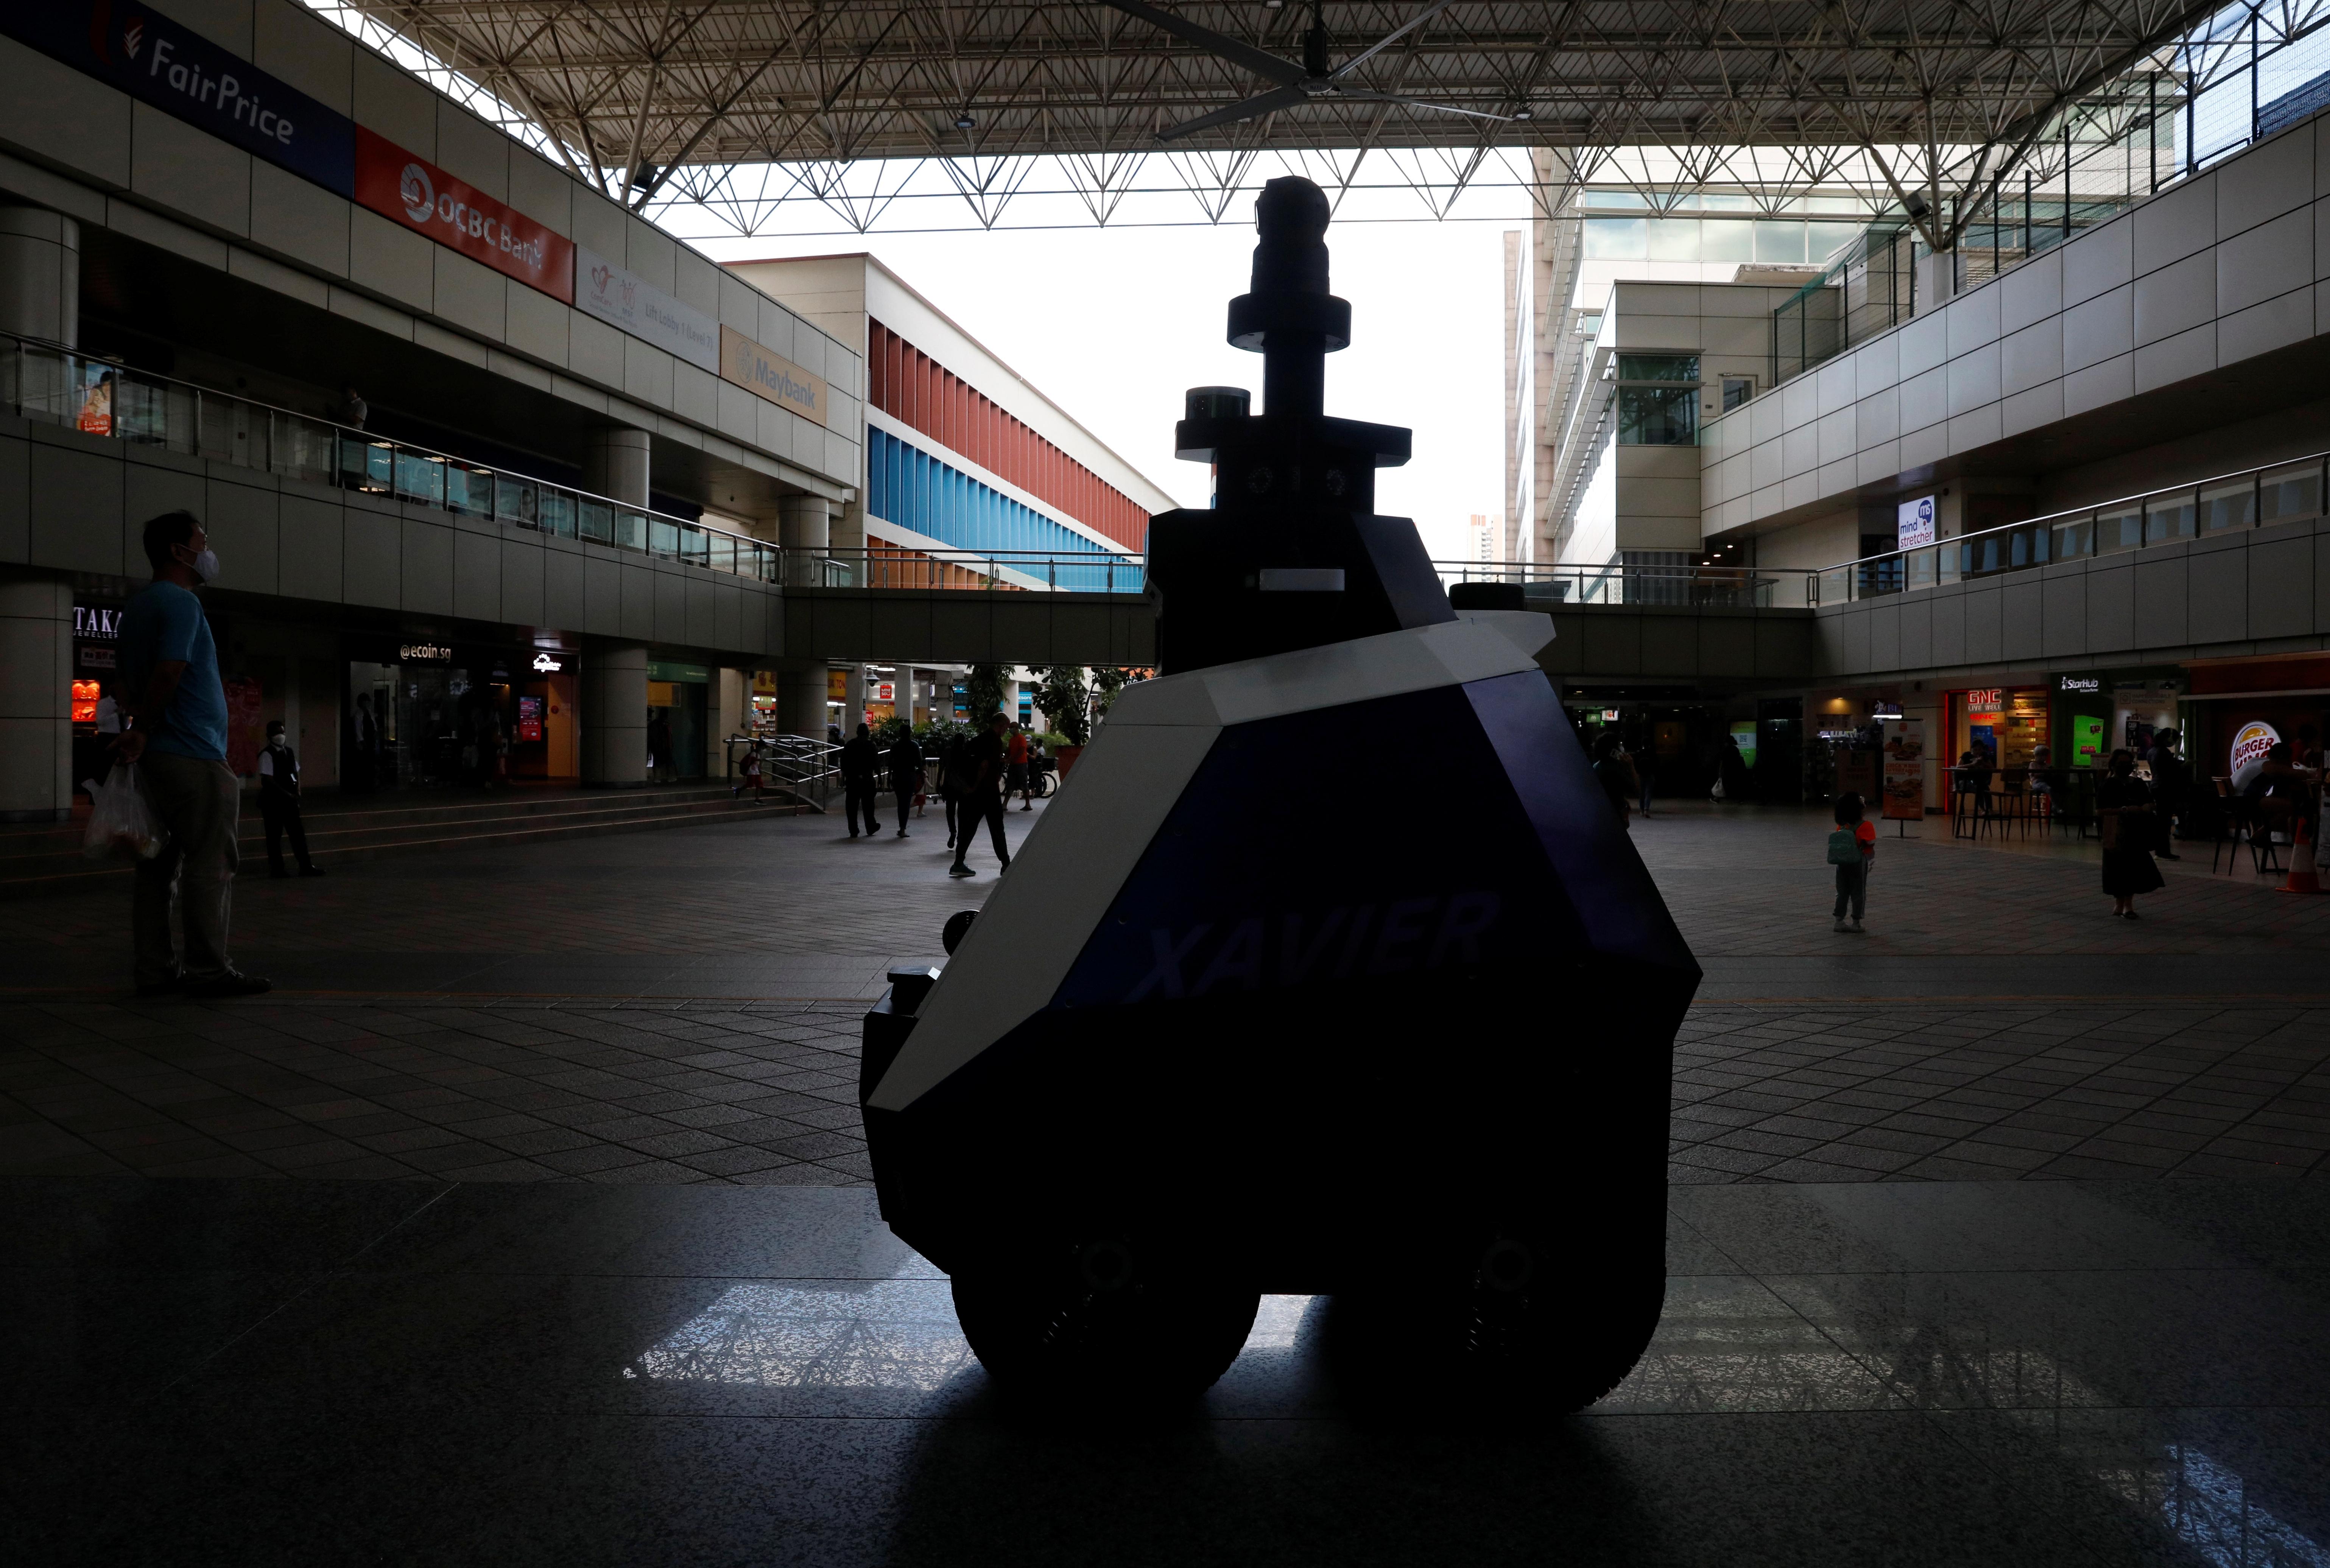 Autonomous robot Xavier patrols a neighbourhood mall to detect